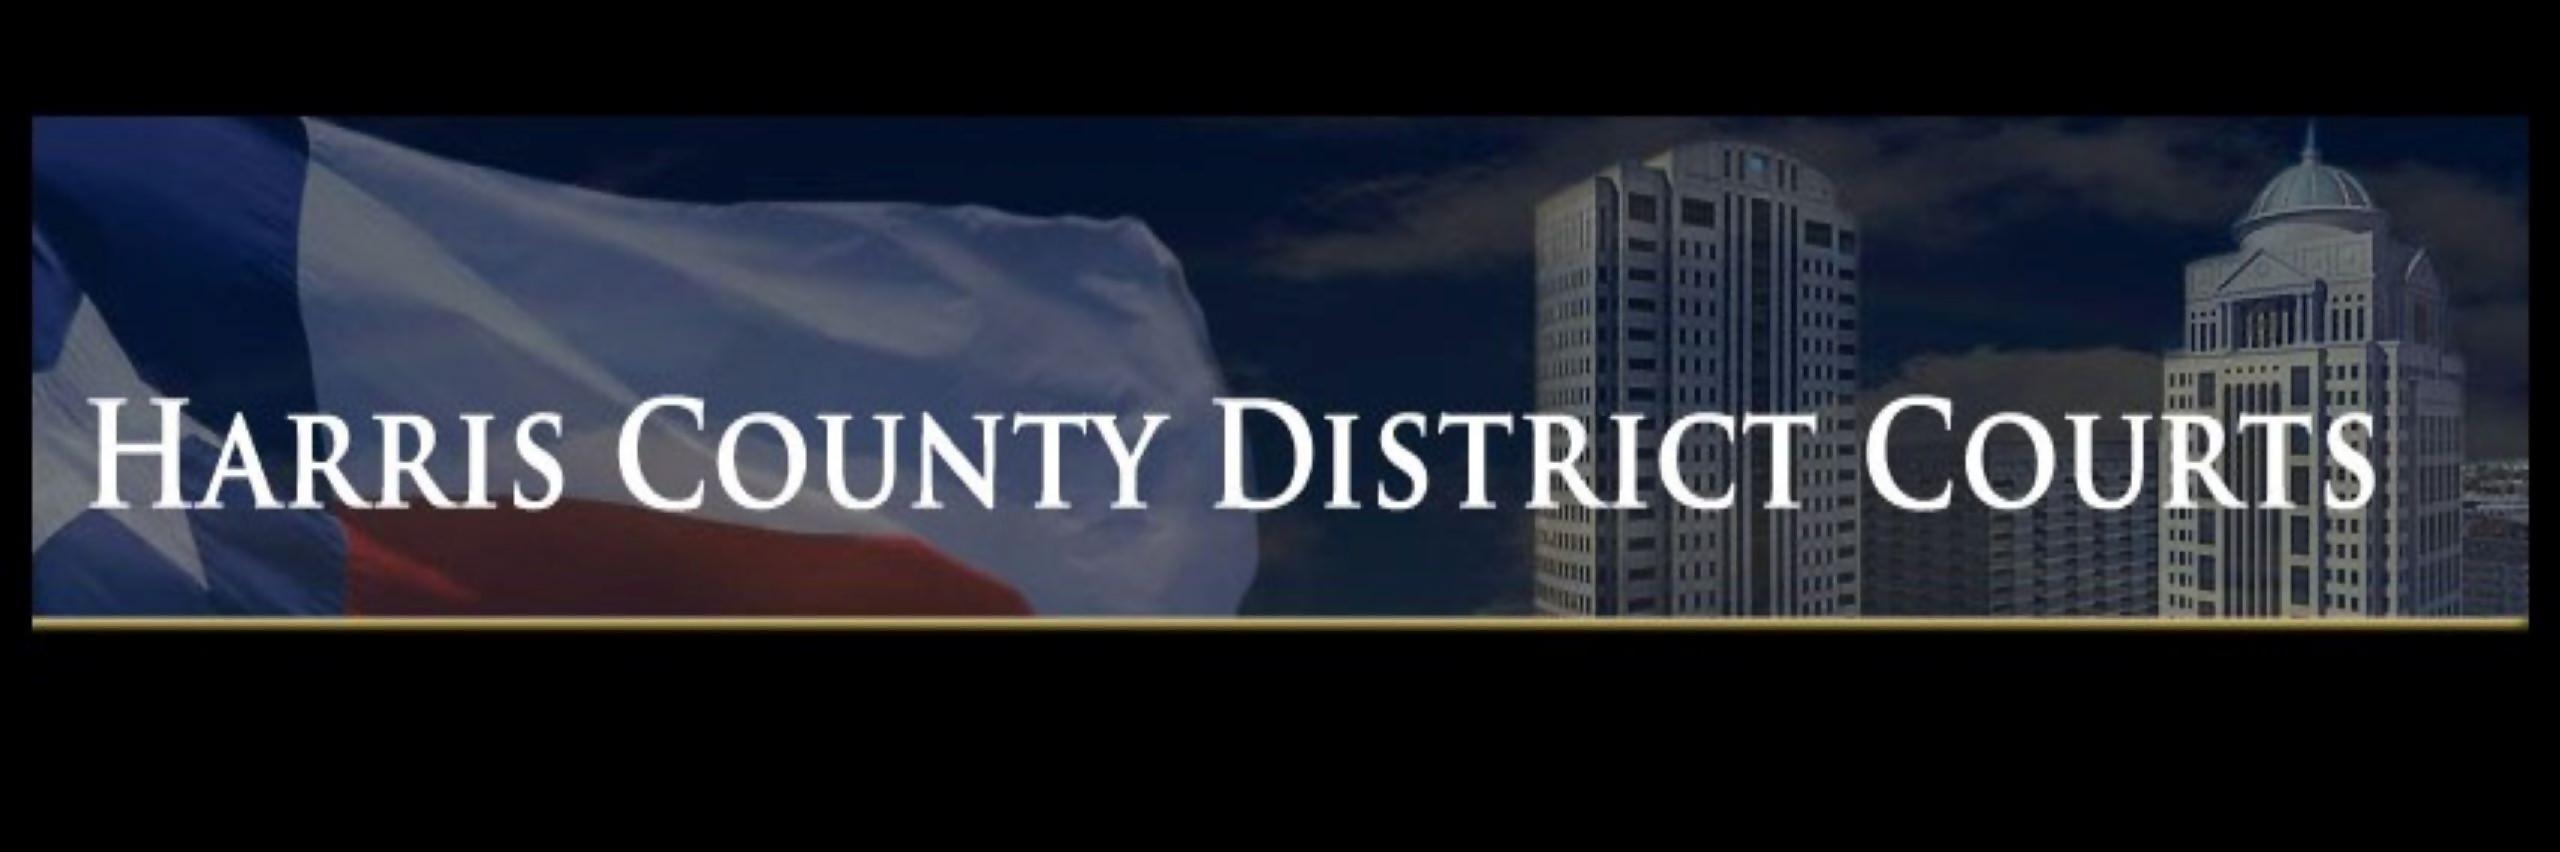 129th District Court - Live Stream